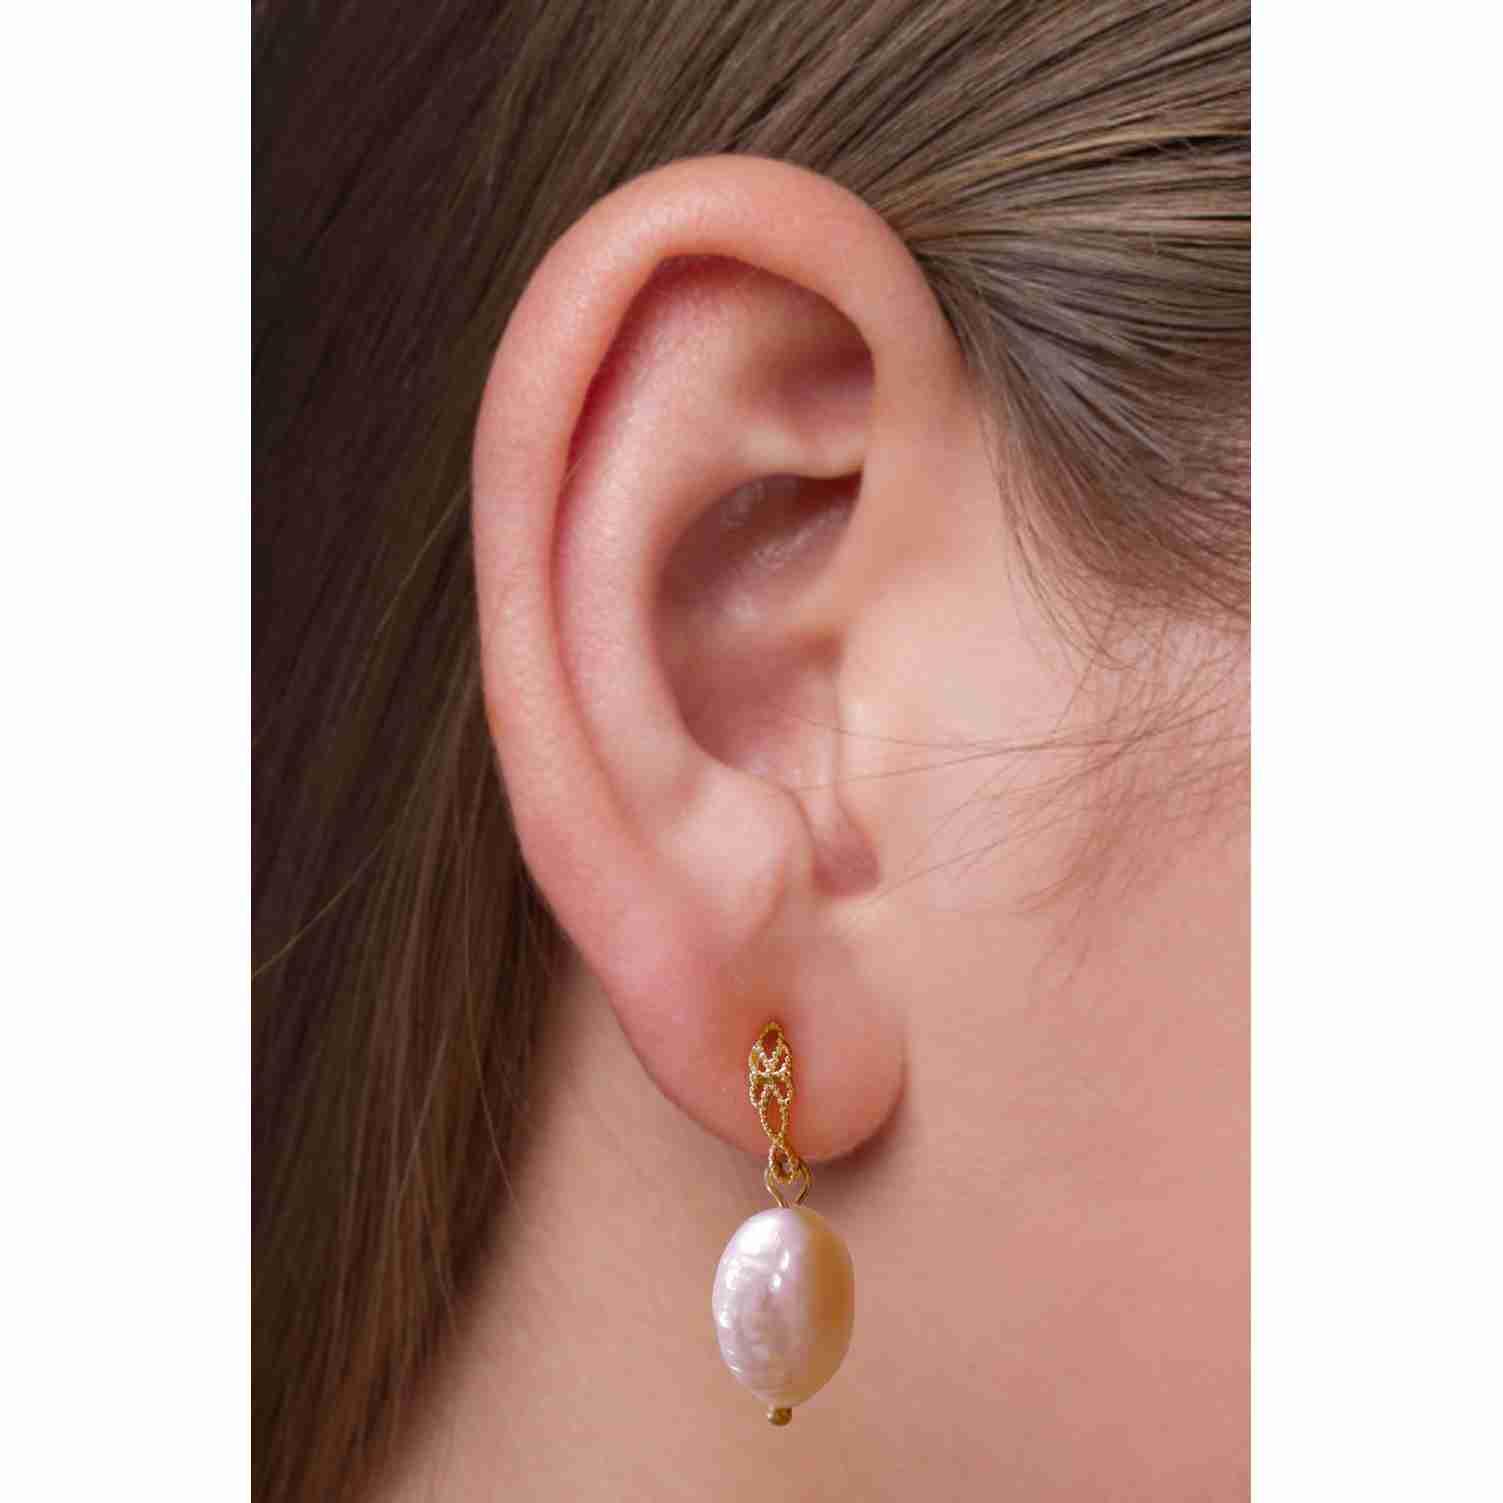 non-pierced-earrings-clip-on-dangle-earrings with discount code